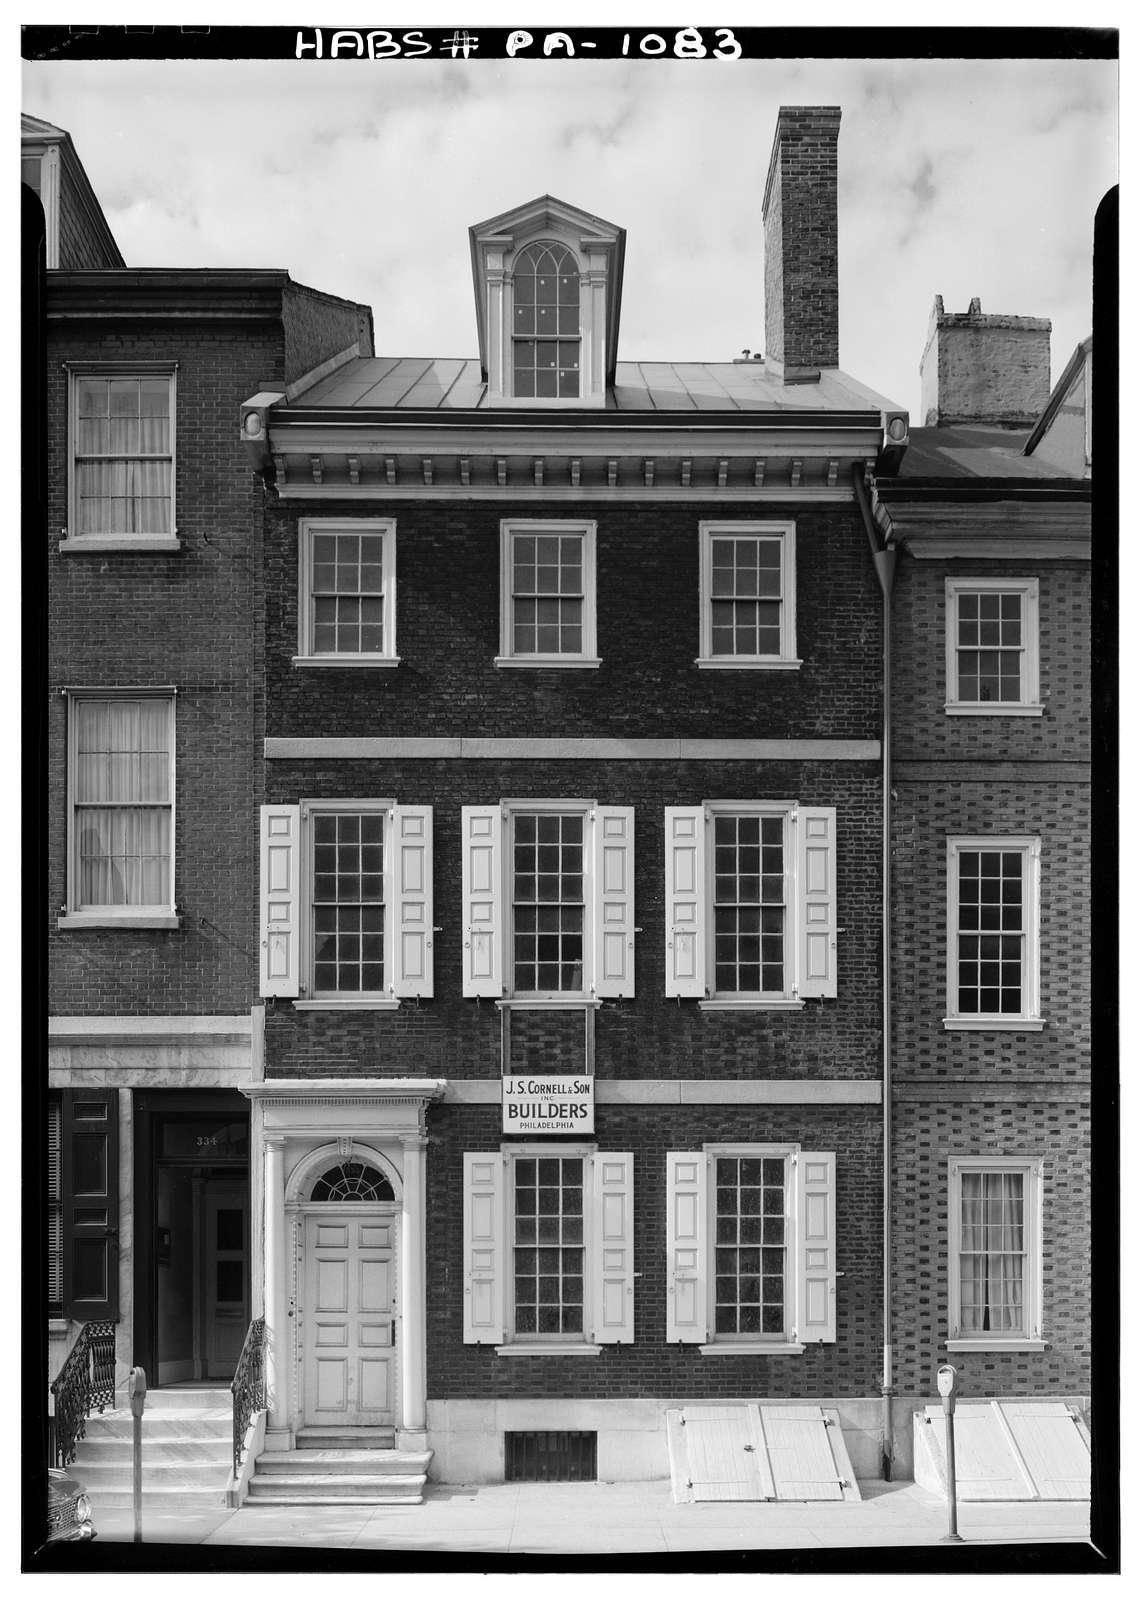 Pancoast-Lewis-Wharton House, 336 Spruce Street, Philadelphia, Philadelphia County, PA